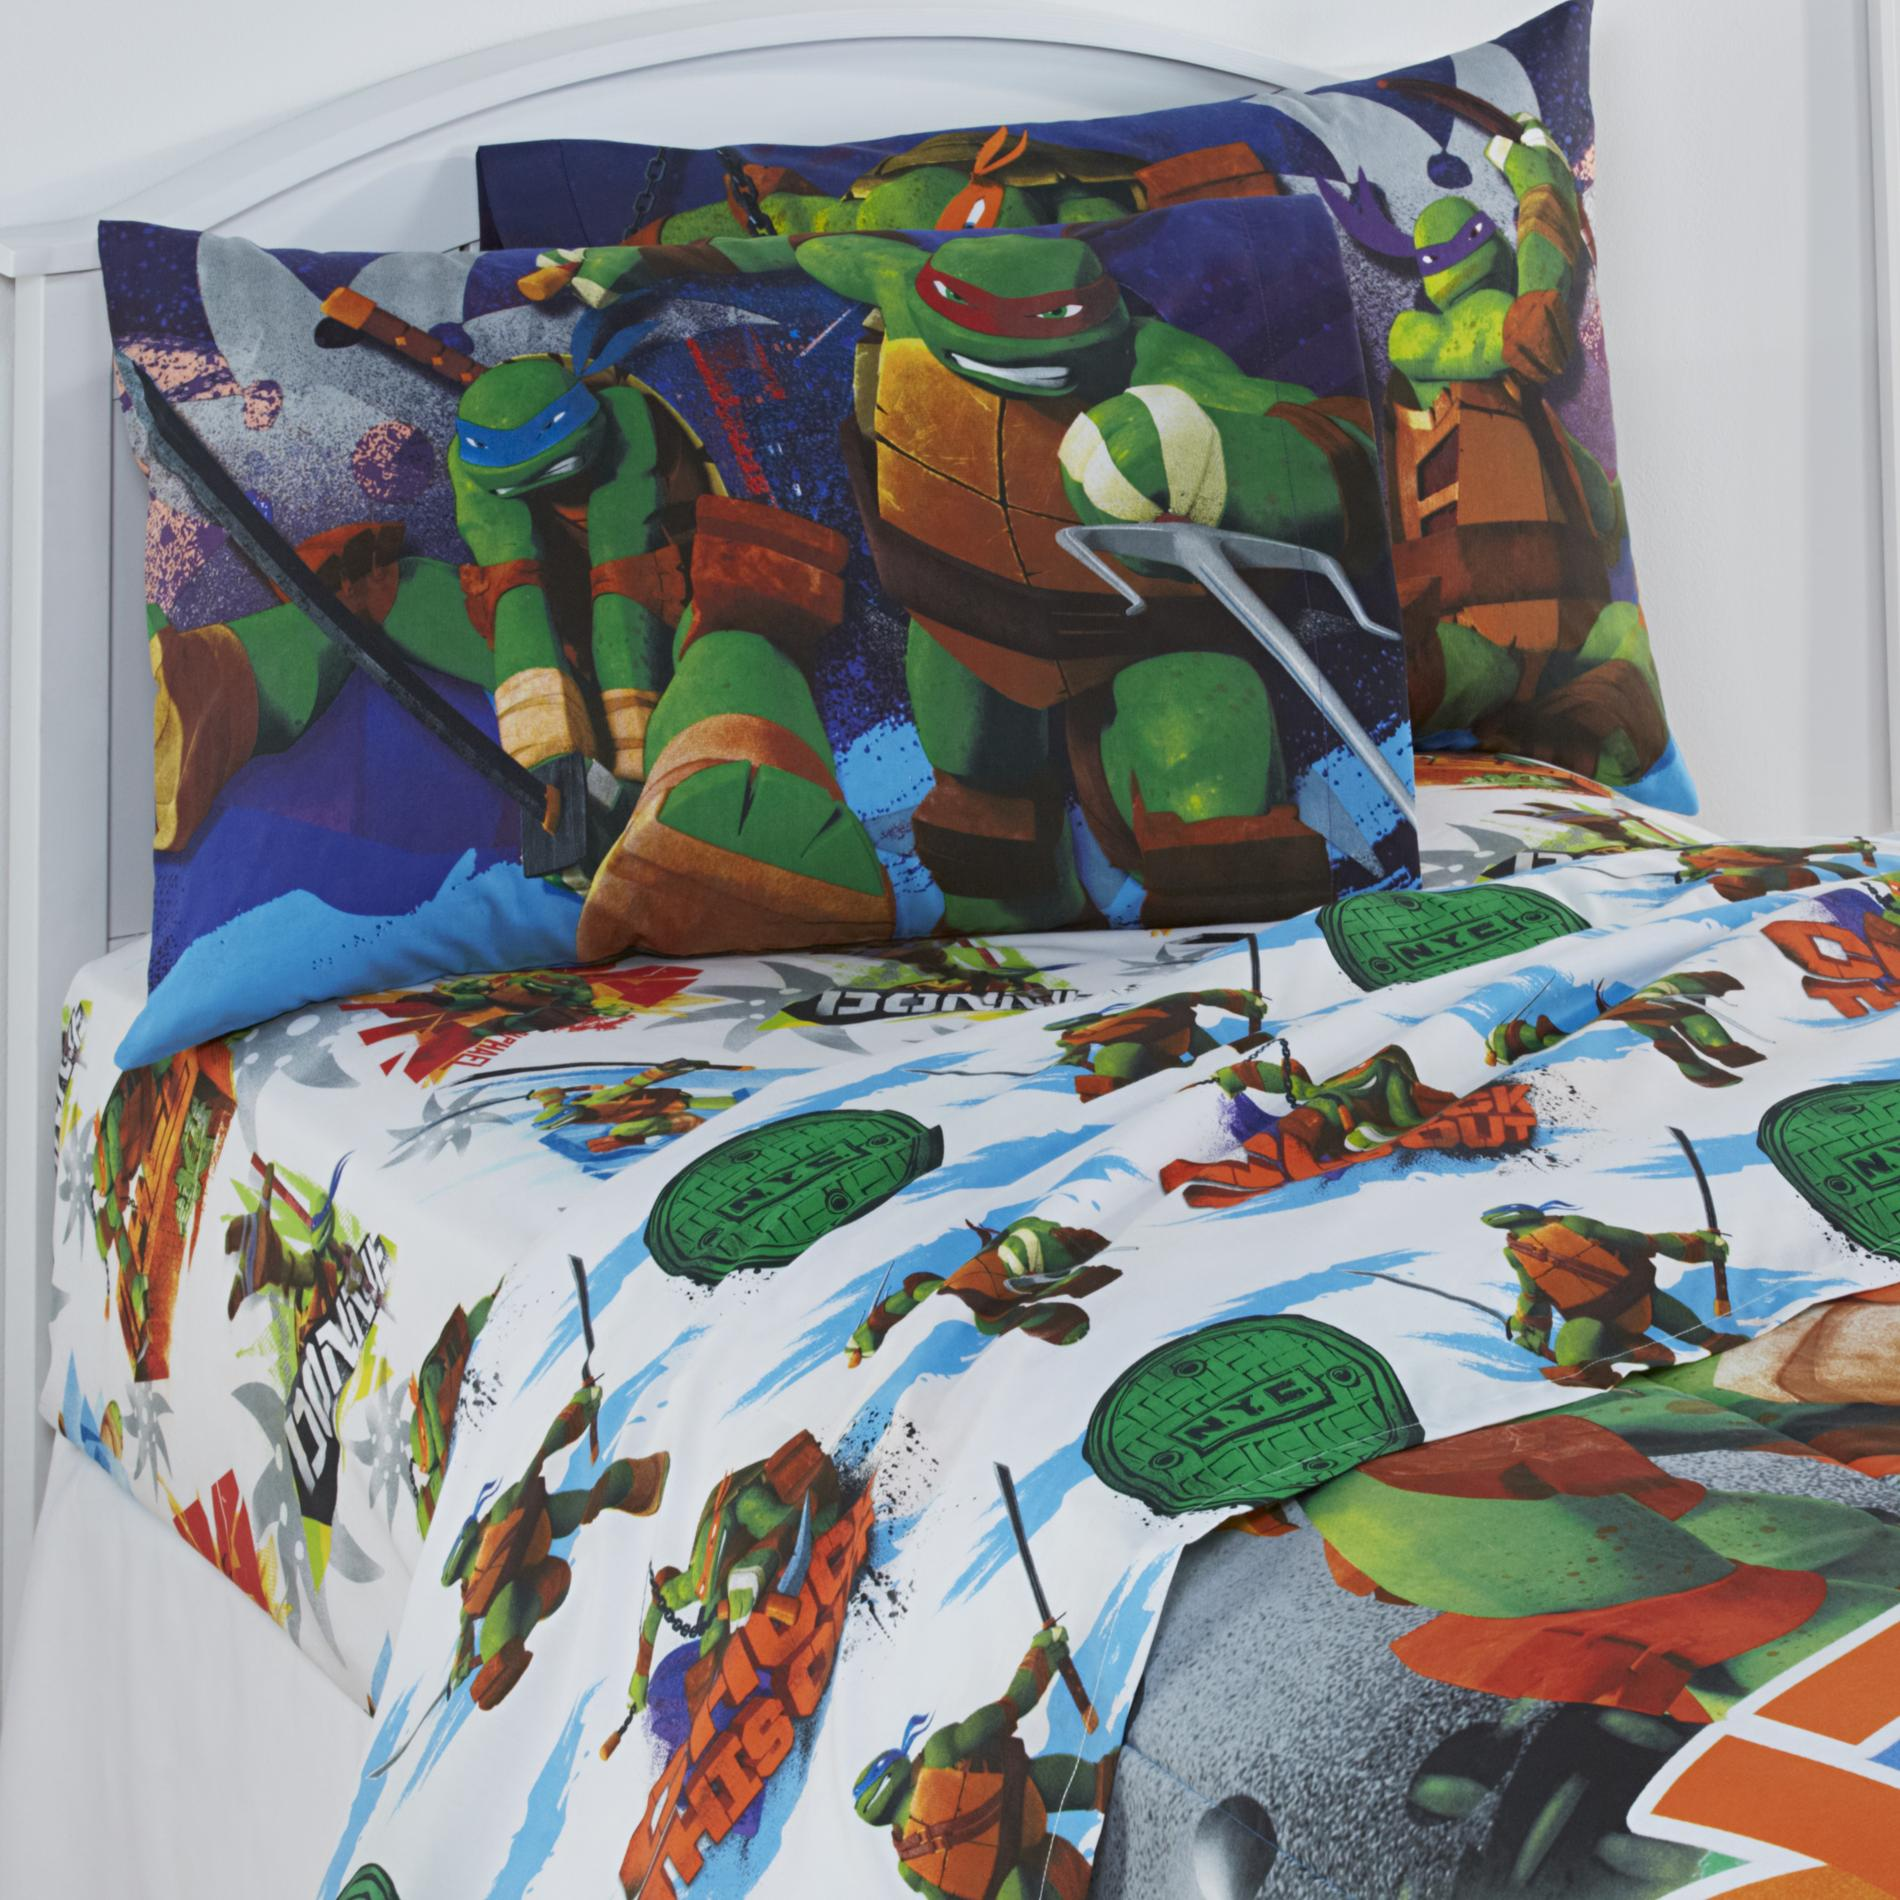 Teenage Mutant Ninja Turtles Twin Bed Sheet Set Bedding For Kids Boys Bedroom